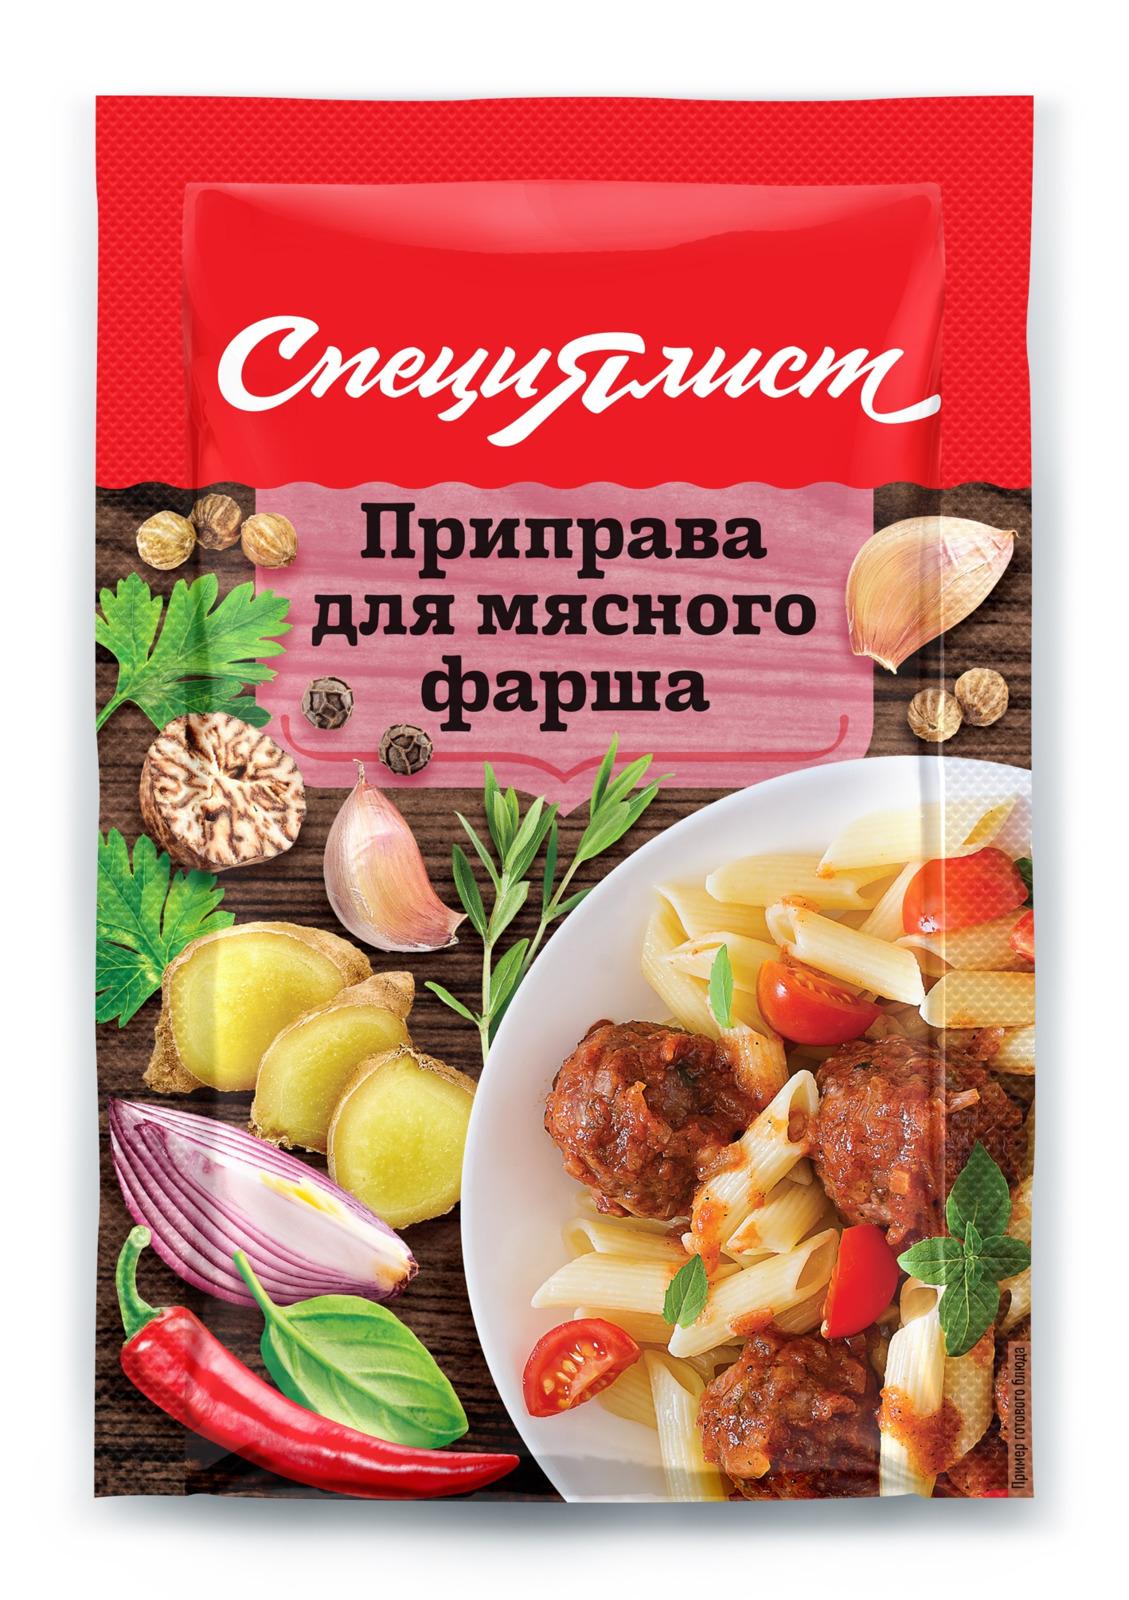 Приправа СпециЯлист, для мясного фарша, 15 г х 5 шт